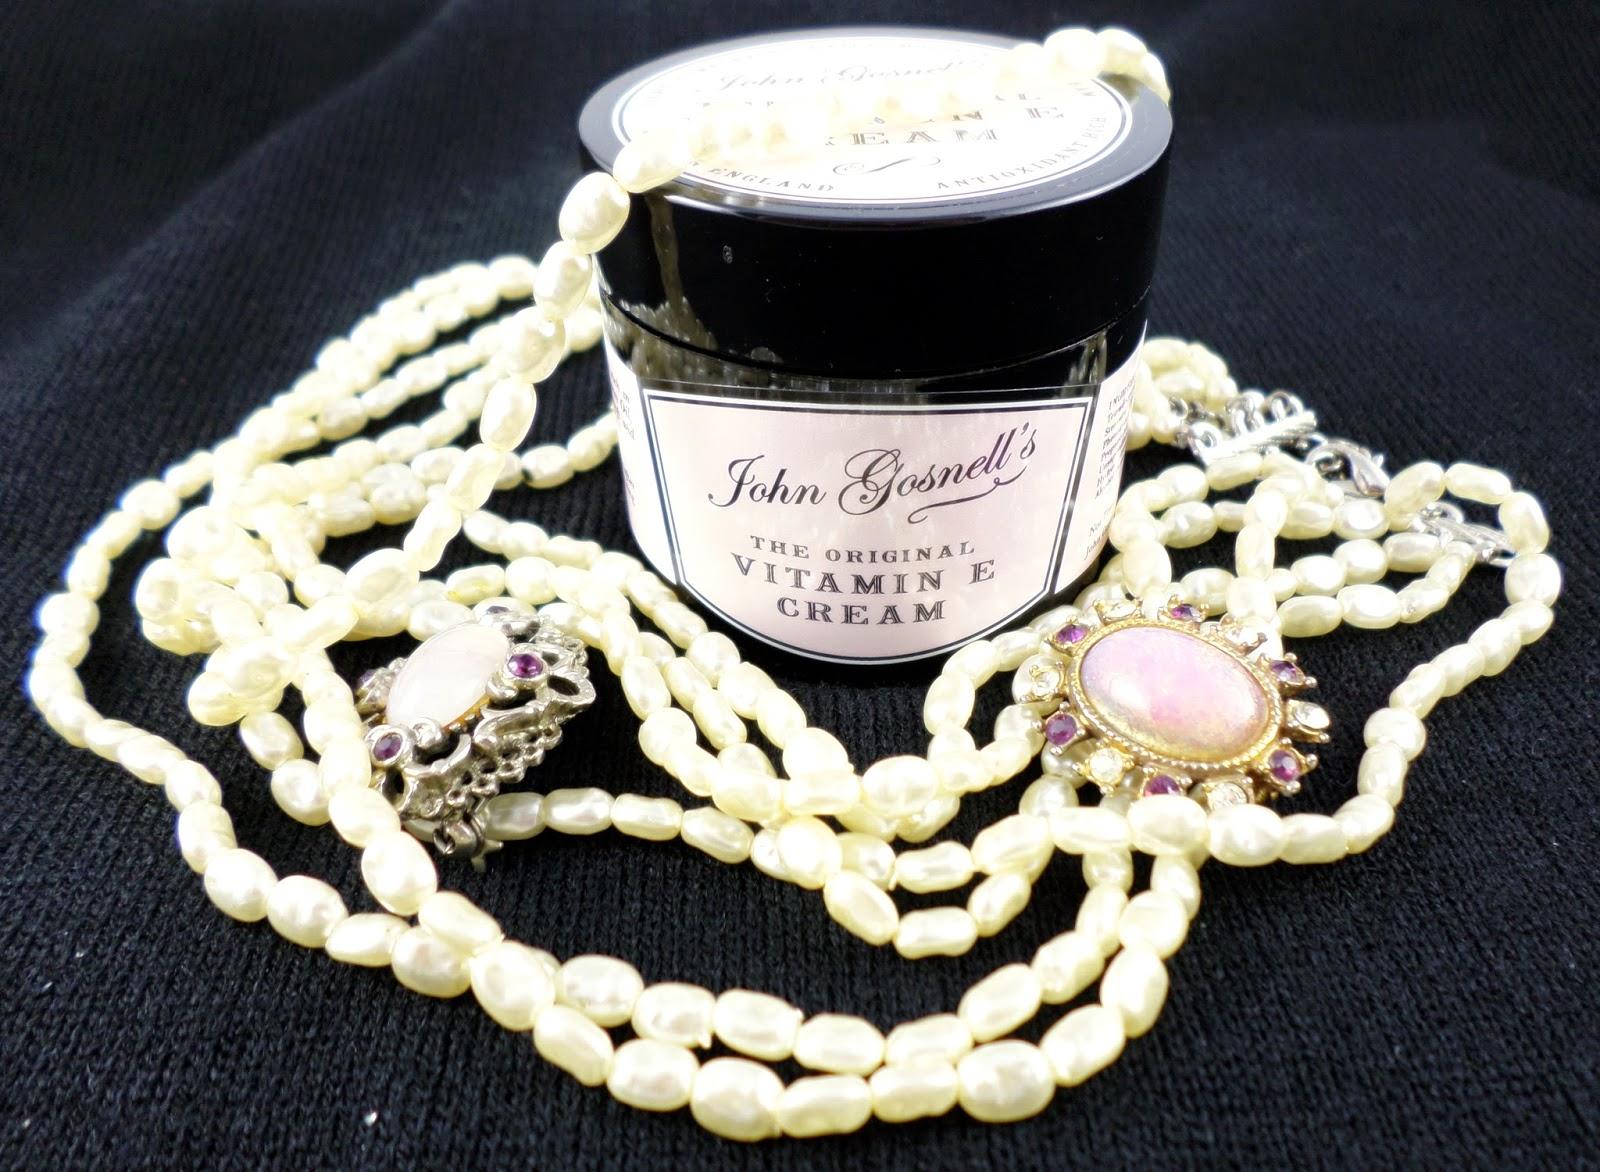 John Gosnell's Original Vitamin E Cream Review